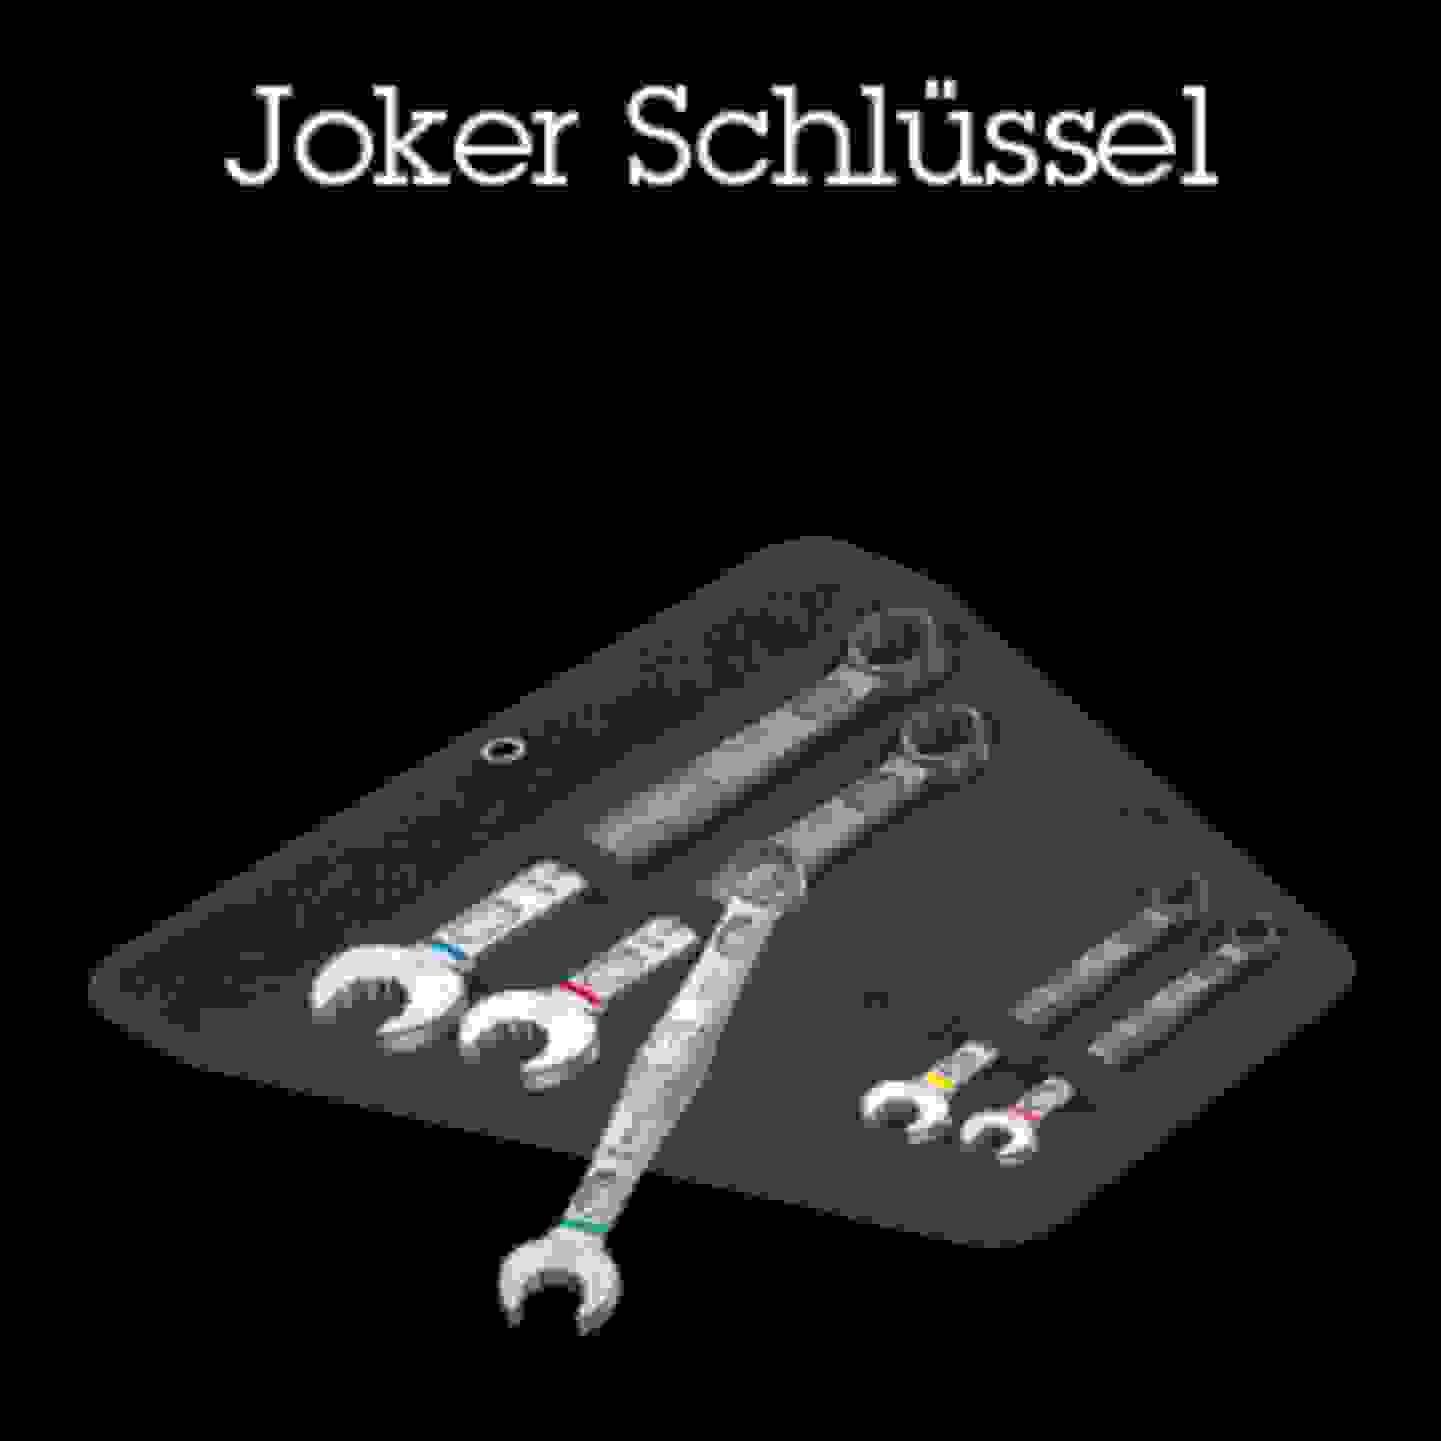 Joker Schlüssel